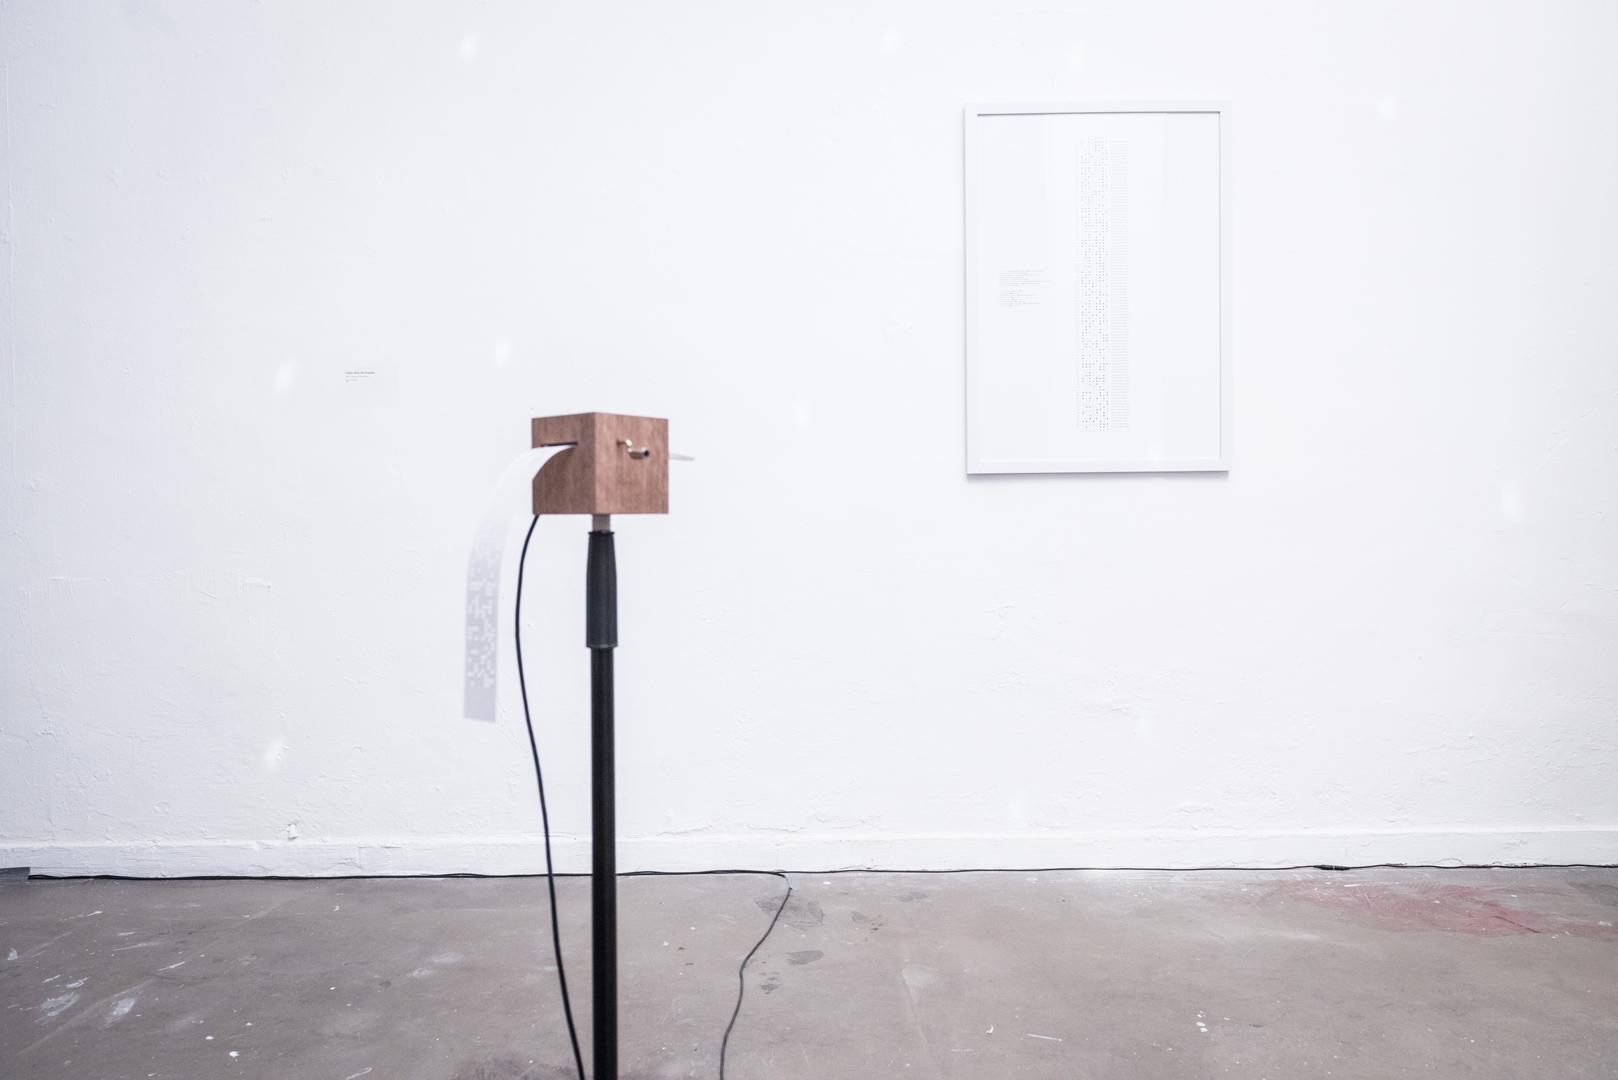 ©2016, Takuma Takahashi and Shugo Hirao, A Digital Music Box Ensemble